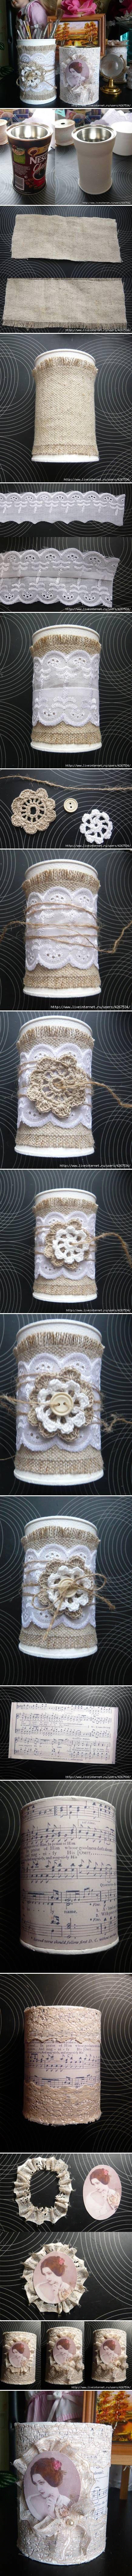 DIY Nice Decorated Jars DIY Projects